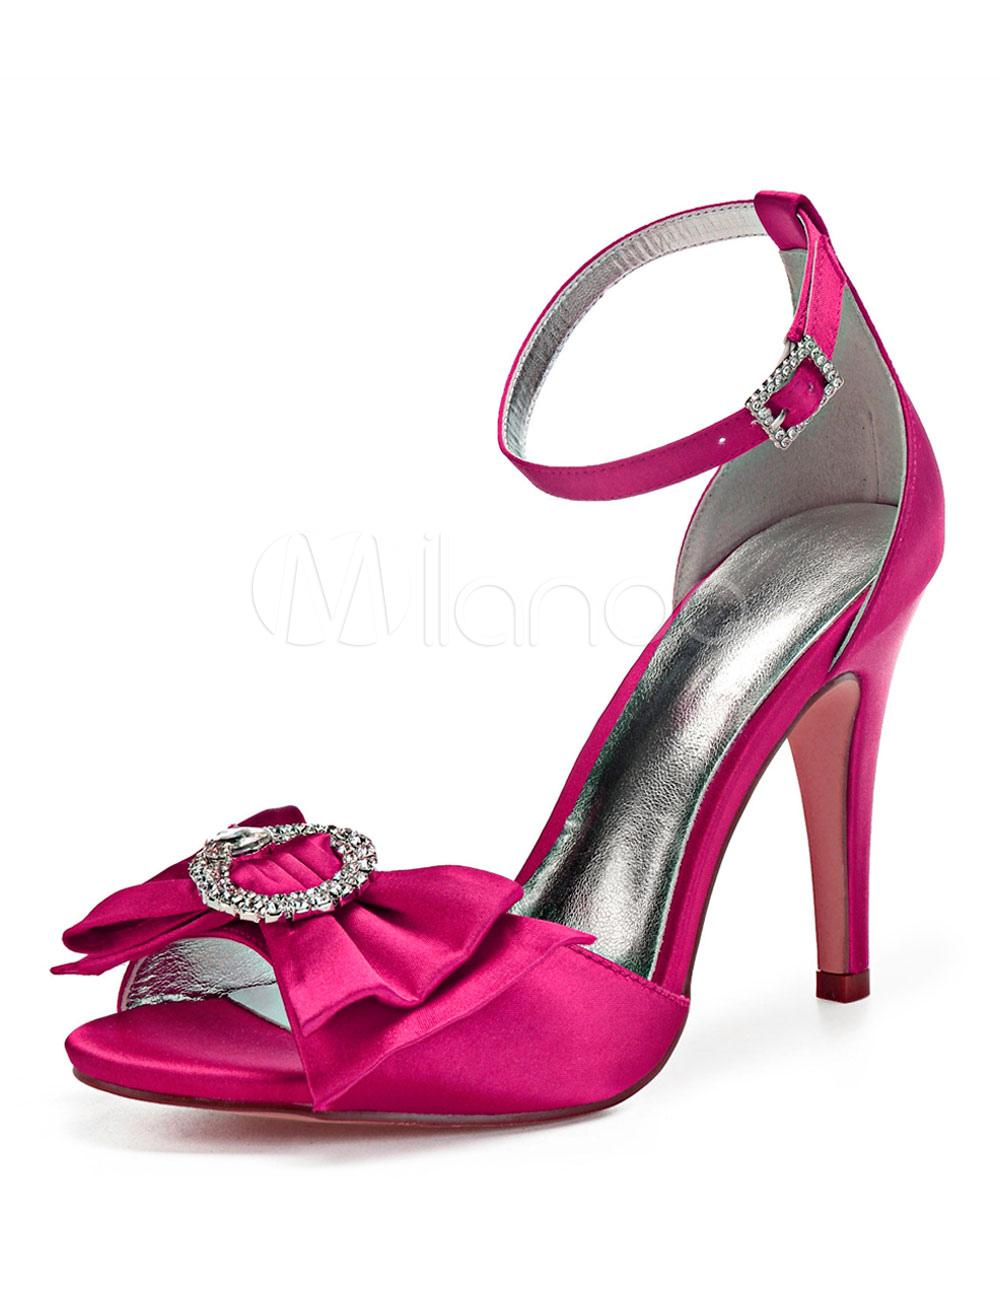 Boda Alto Piedras Sandalias Tobillo Rosa De Del Peep Zapatos Correa Satén Novia Arco Tacón Toe htsdCrQx